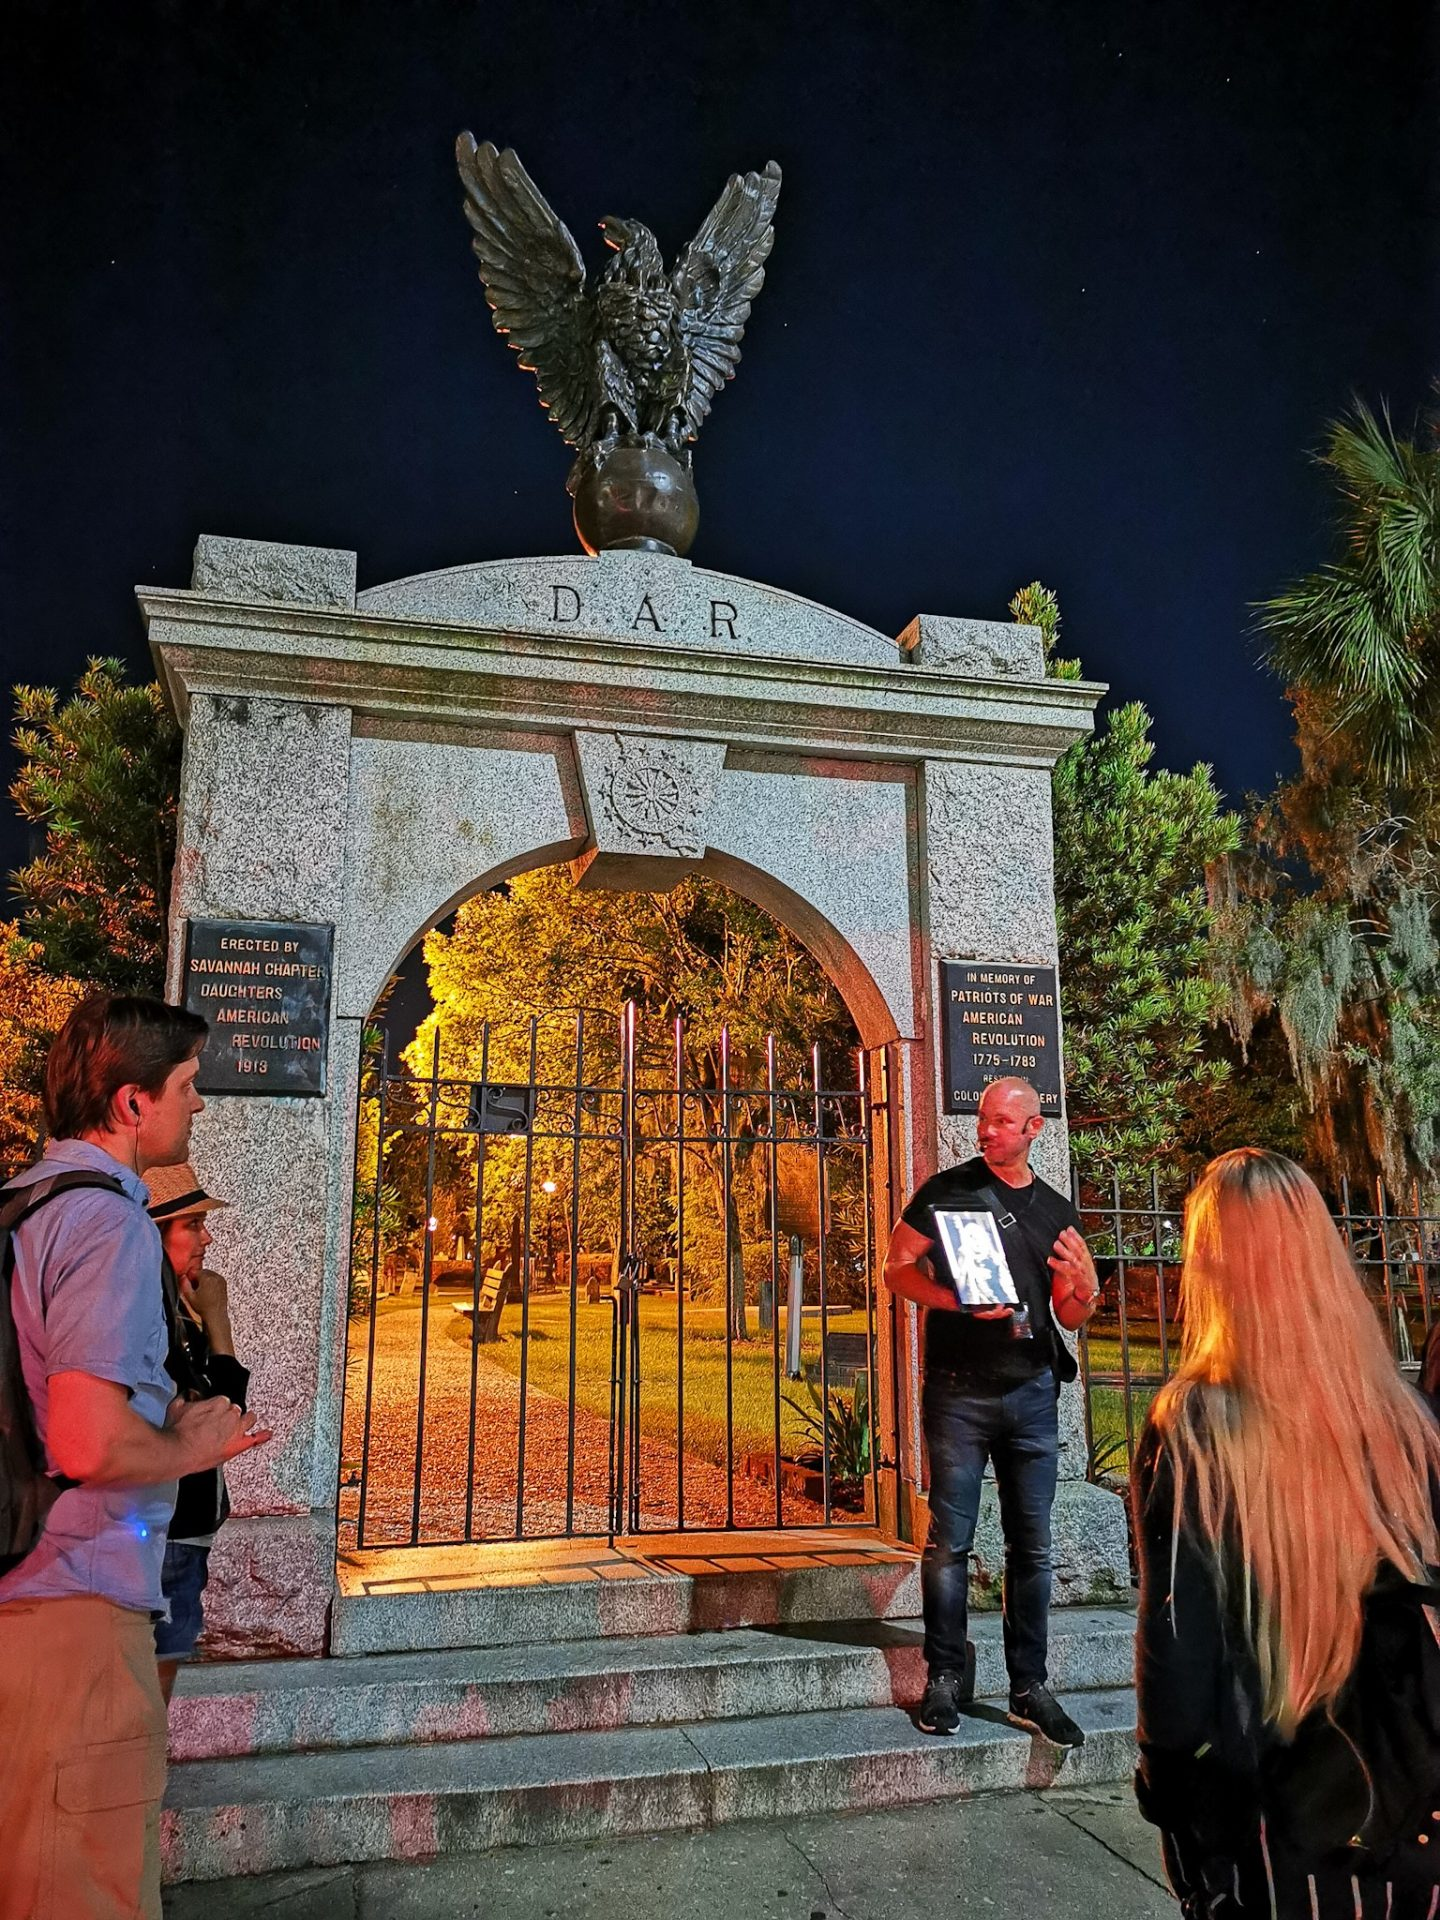 Savannah graveyard cemetery G & T walking ghost tour